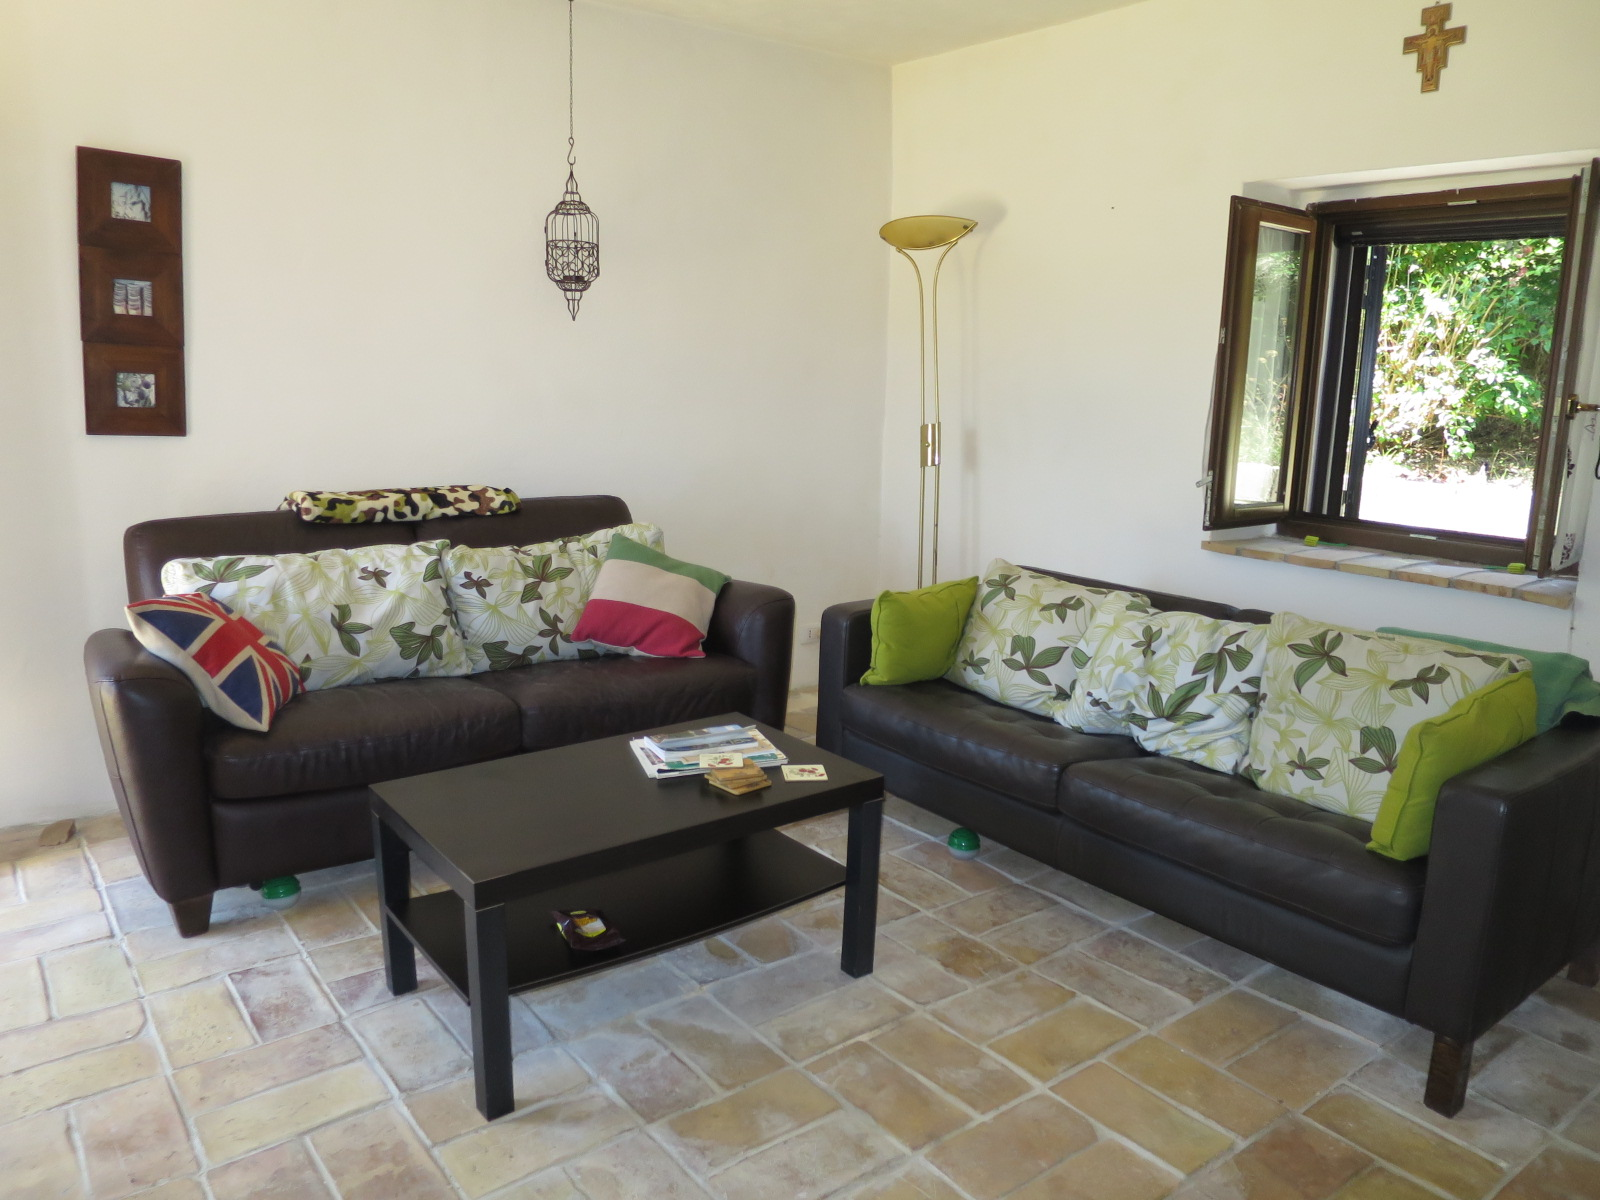 Country Houses Country Houses for sale Montefino (TE), Casa Collina - Montefino - EUR 151.447 330